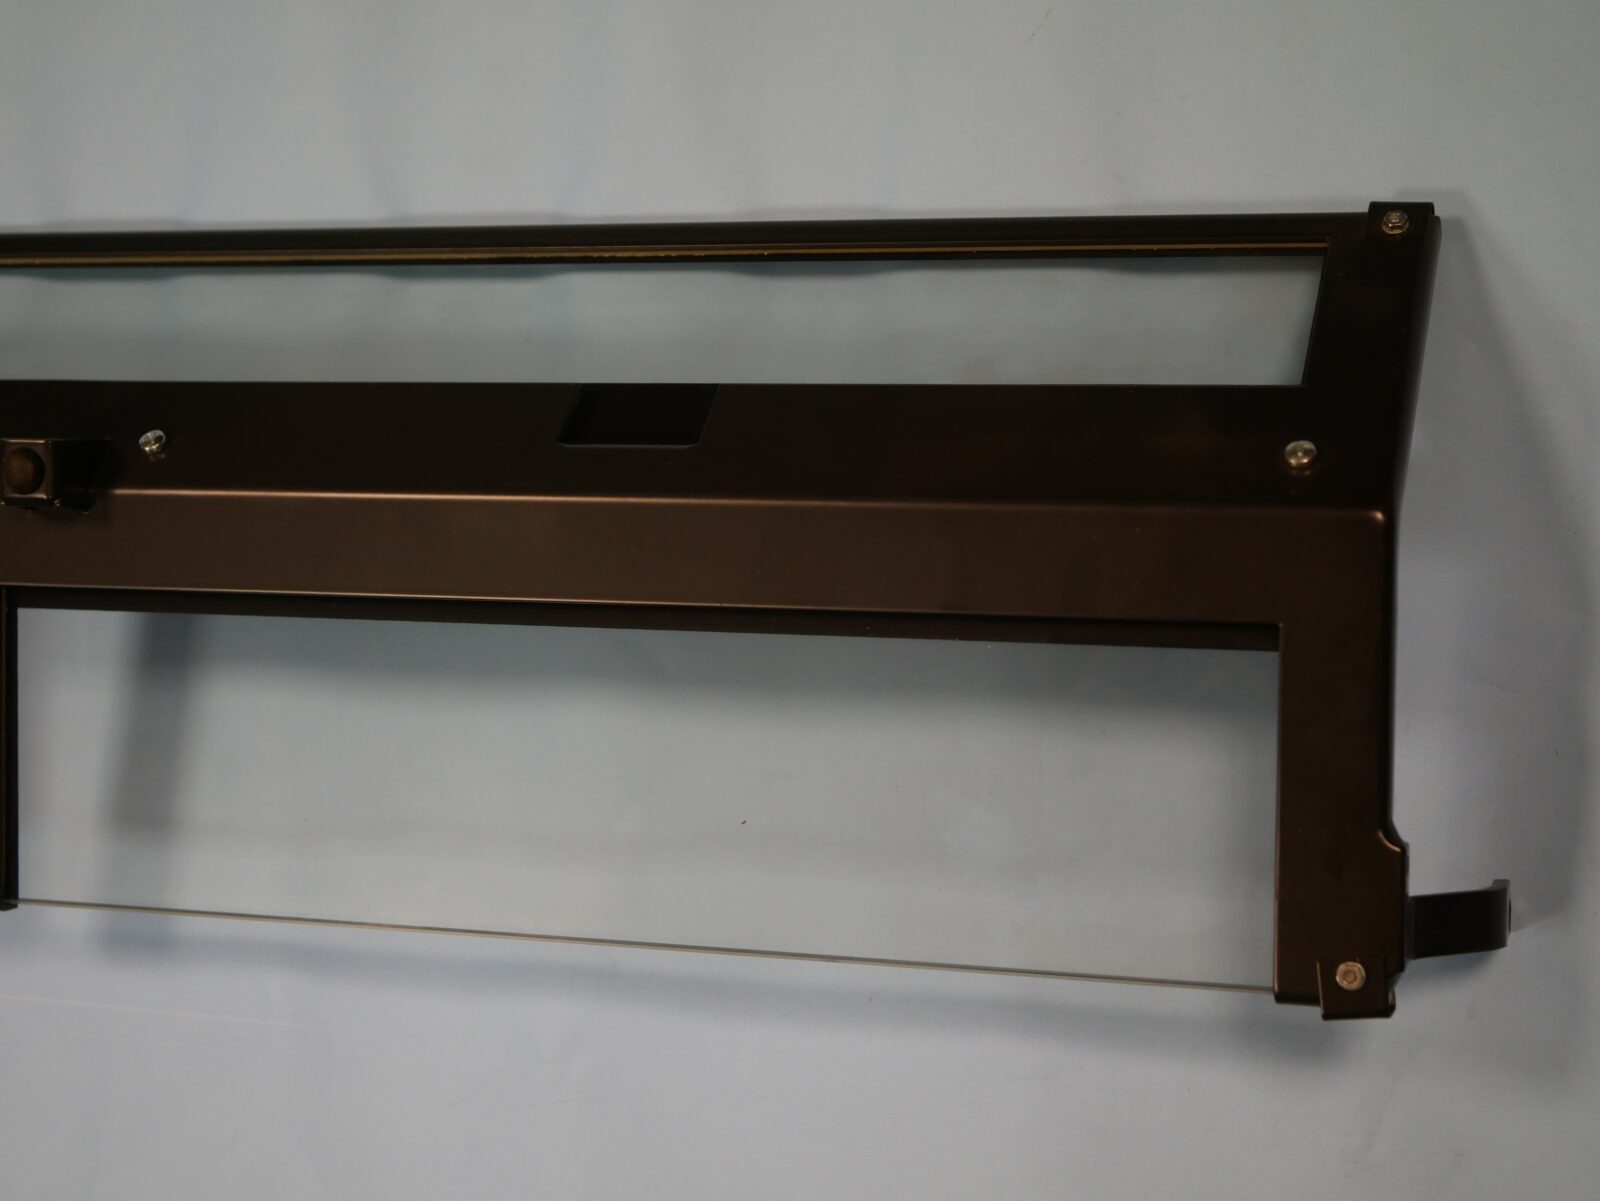 Gloss Infeed Guard for SM/CD 102 HDM: MV.026.949/01